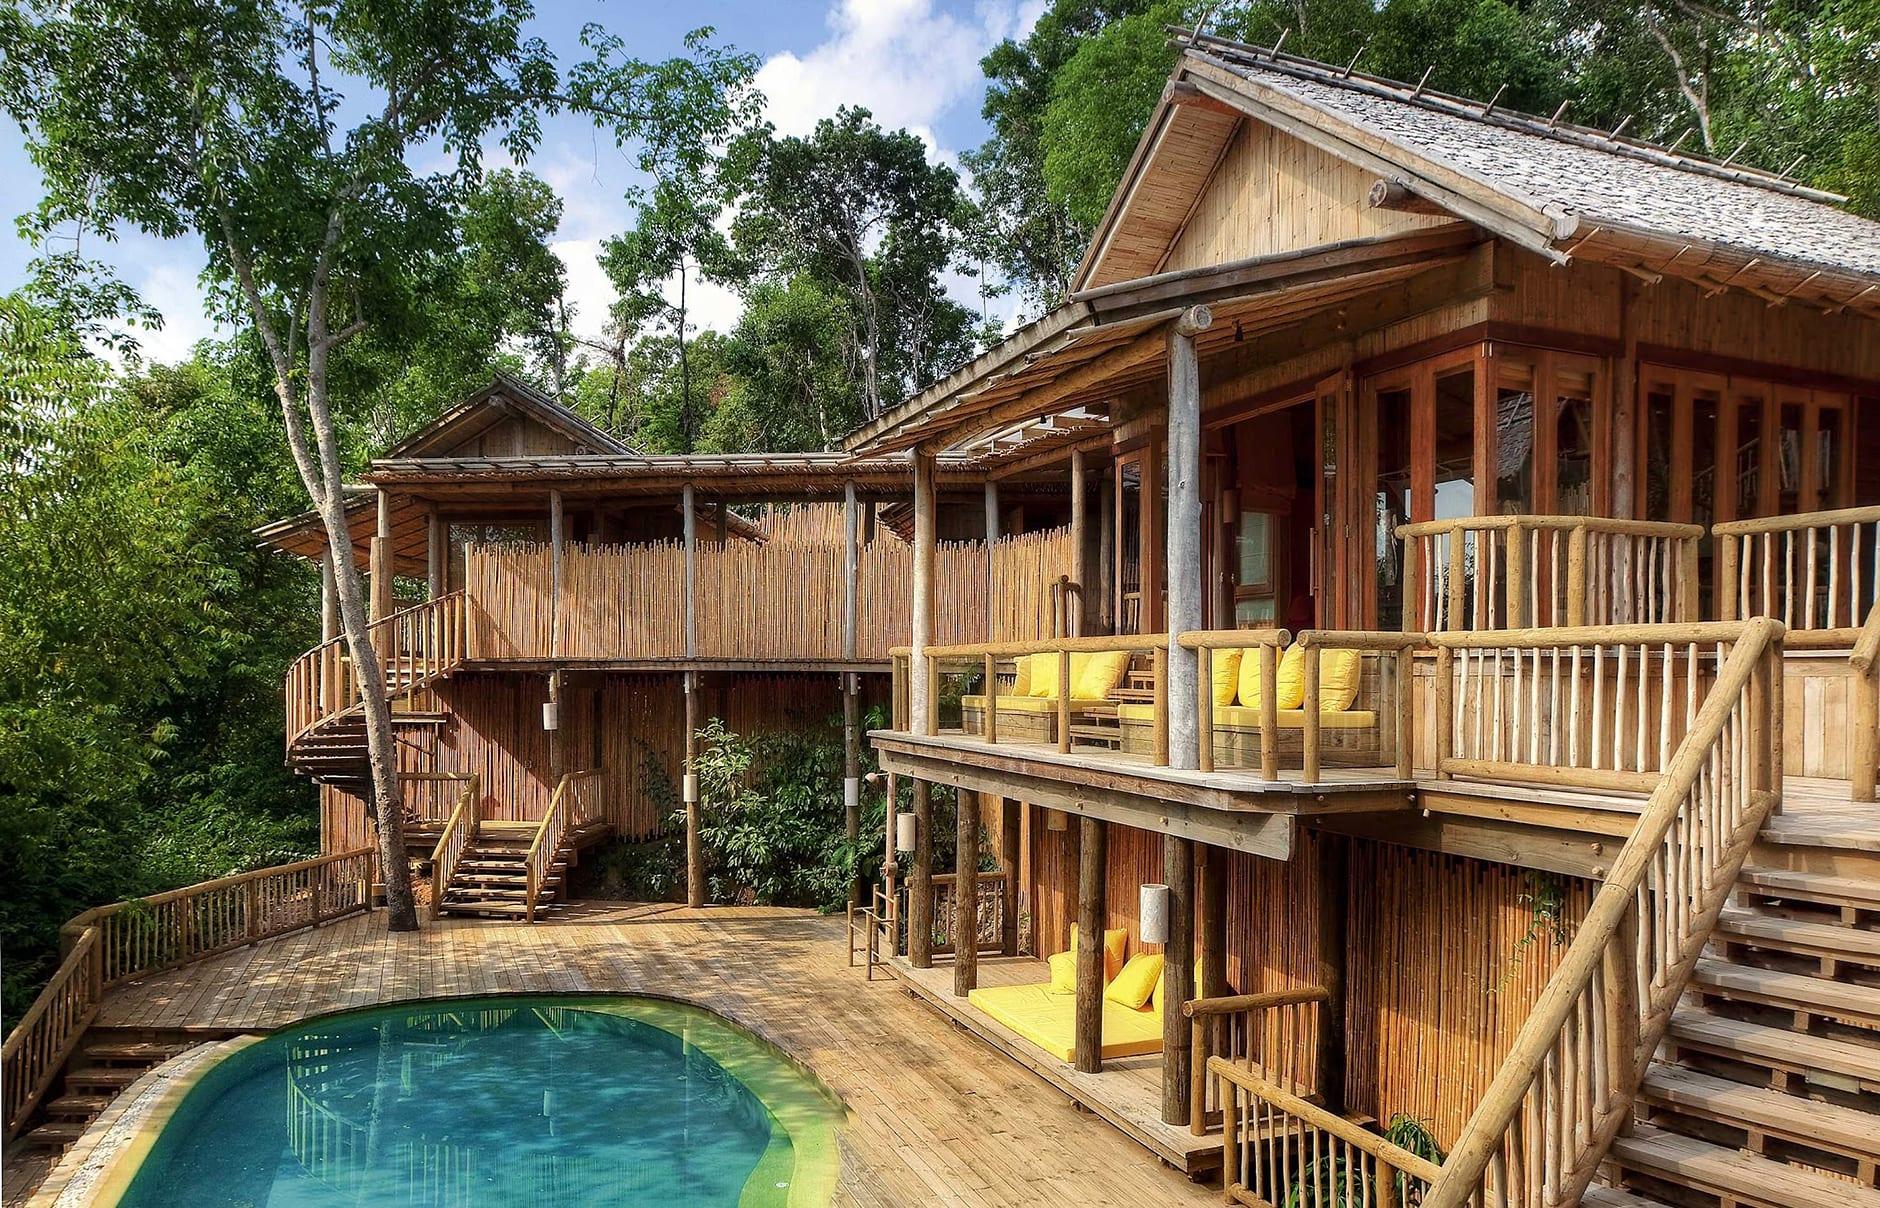 Hill Pool Villa. Soneva Kiri, Koh Kood, Thailand. © Soneva.com